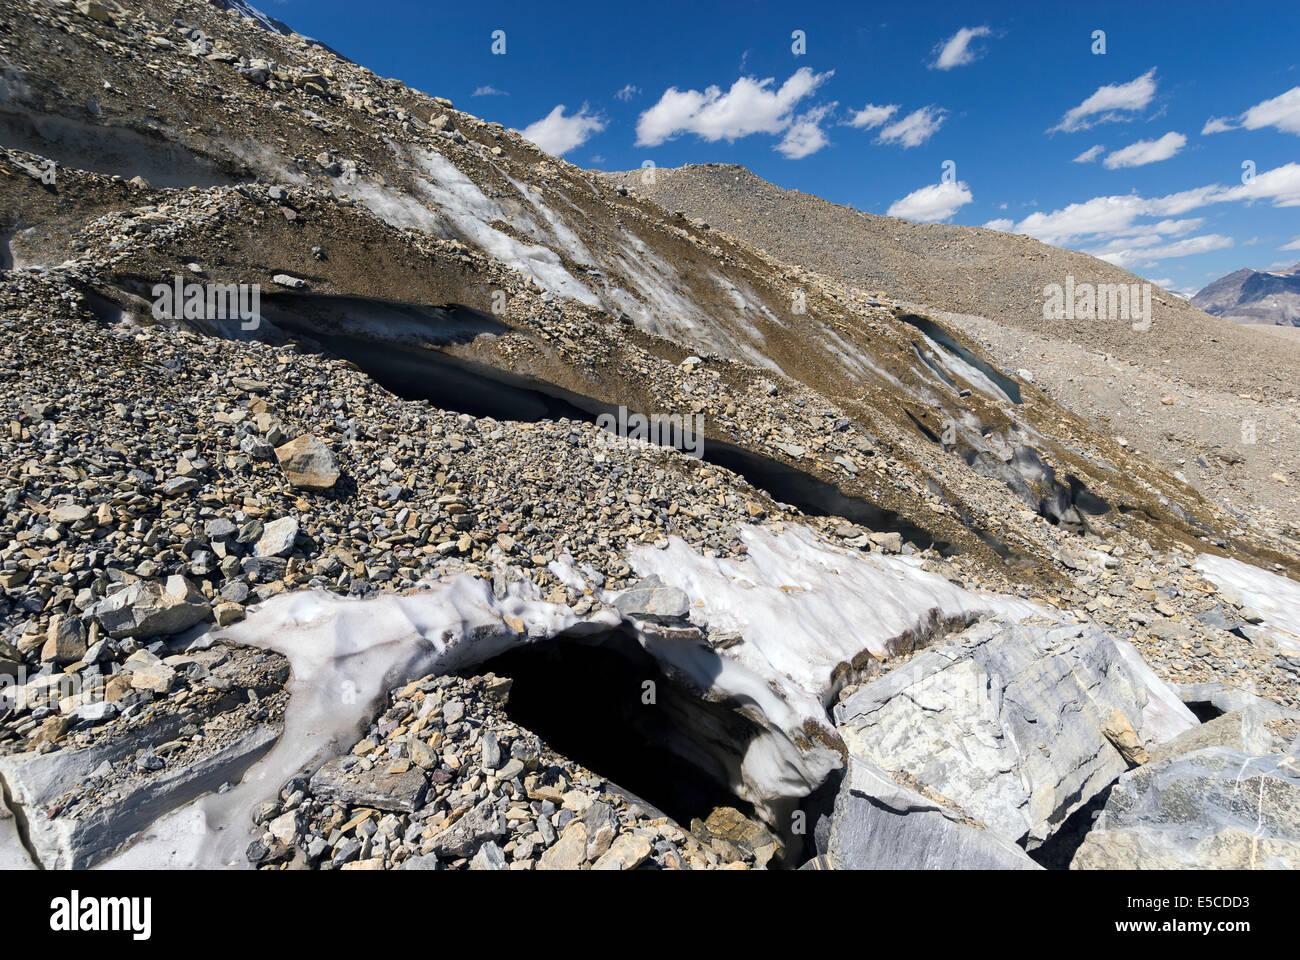 Elk203-2144 Canada, British Columbia, Yoho National Park, Iceland Trail, Emerald Glacier - Stock Image